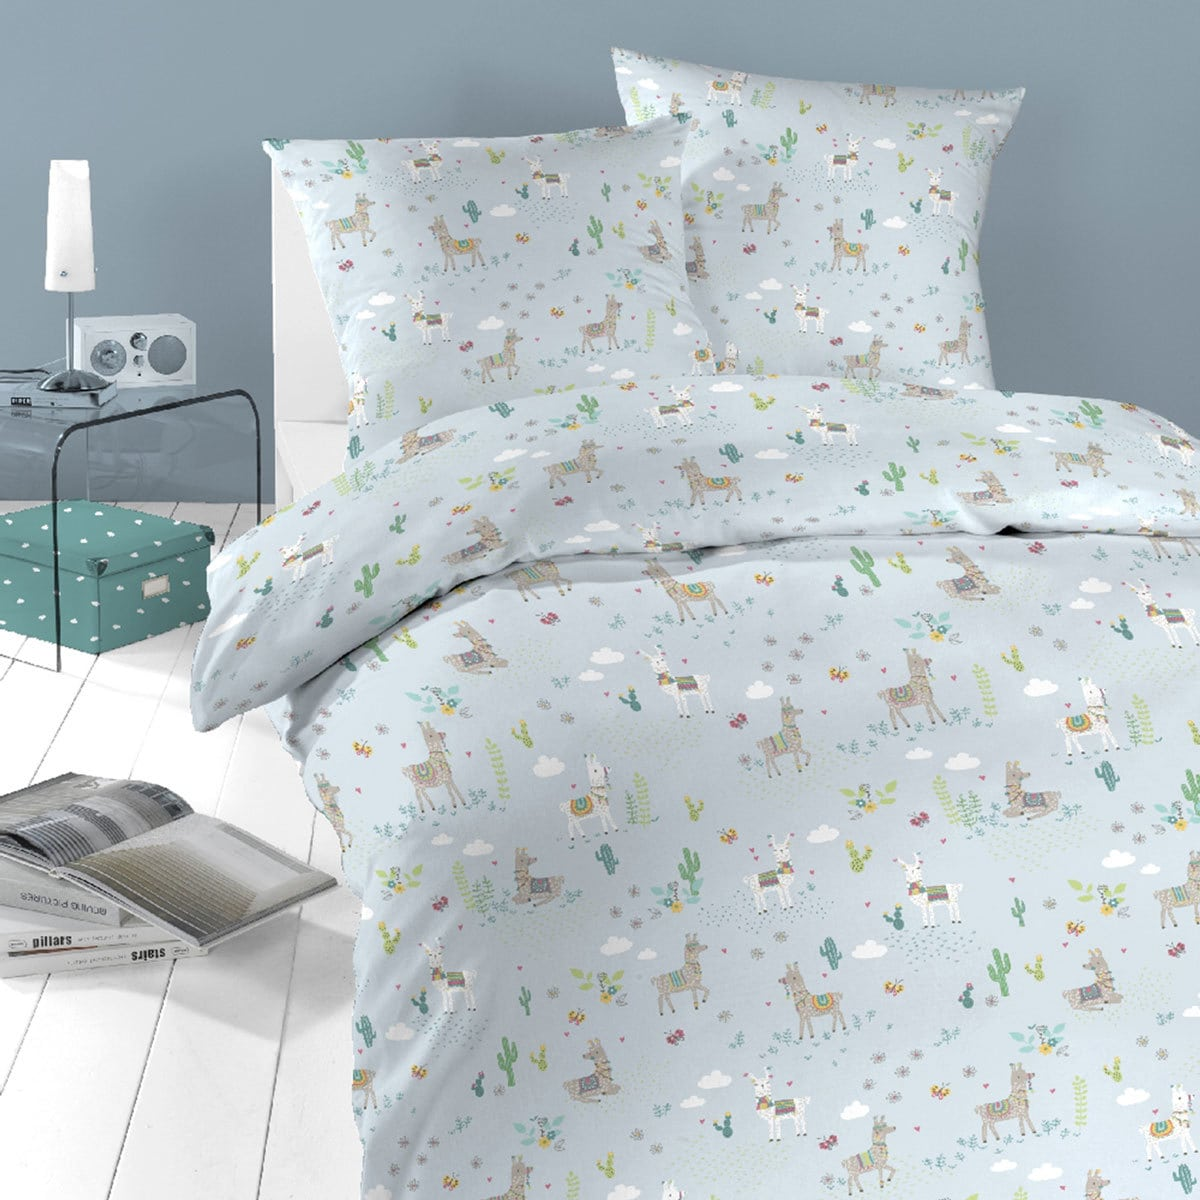 Schlafgut Daily Cotton Bettwäsche Lama himmelblau